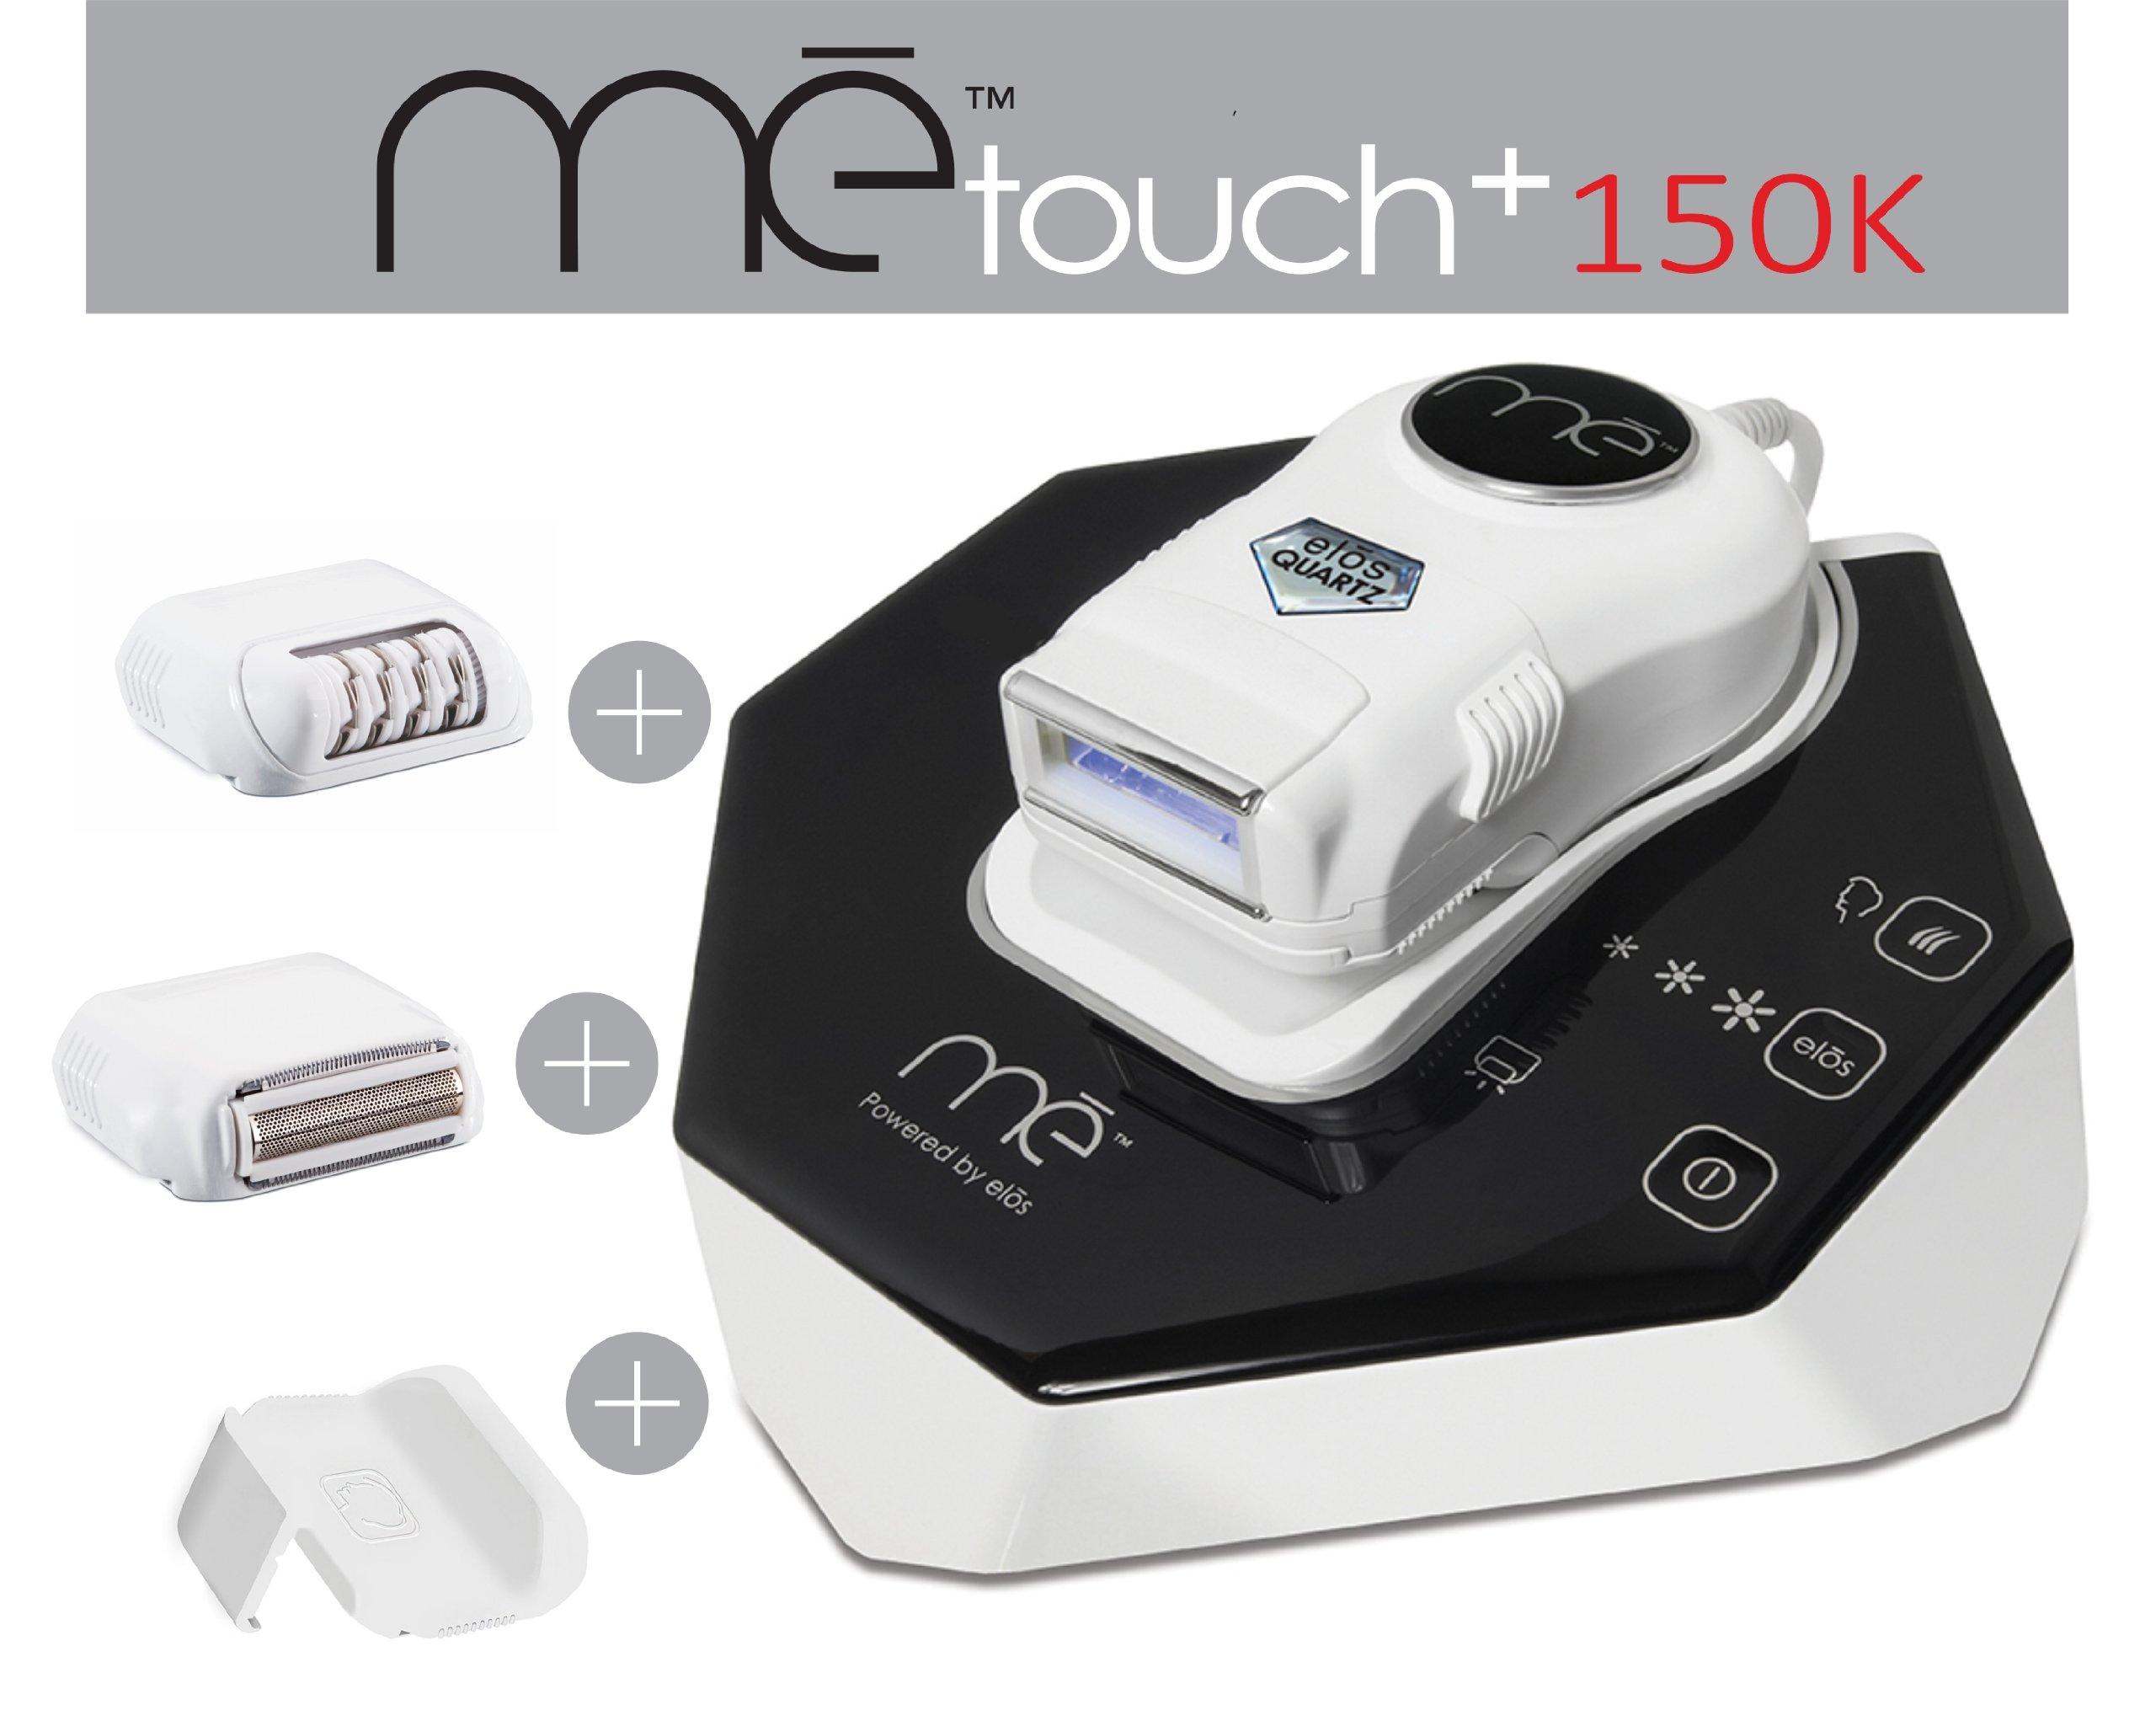 The New Elos Touch + 150,000 Puls Quartz Lamp + Epilator + Shaver + Precision Adaptor